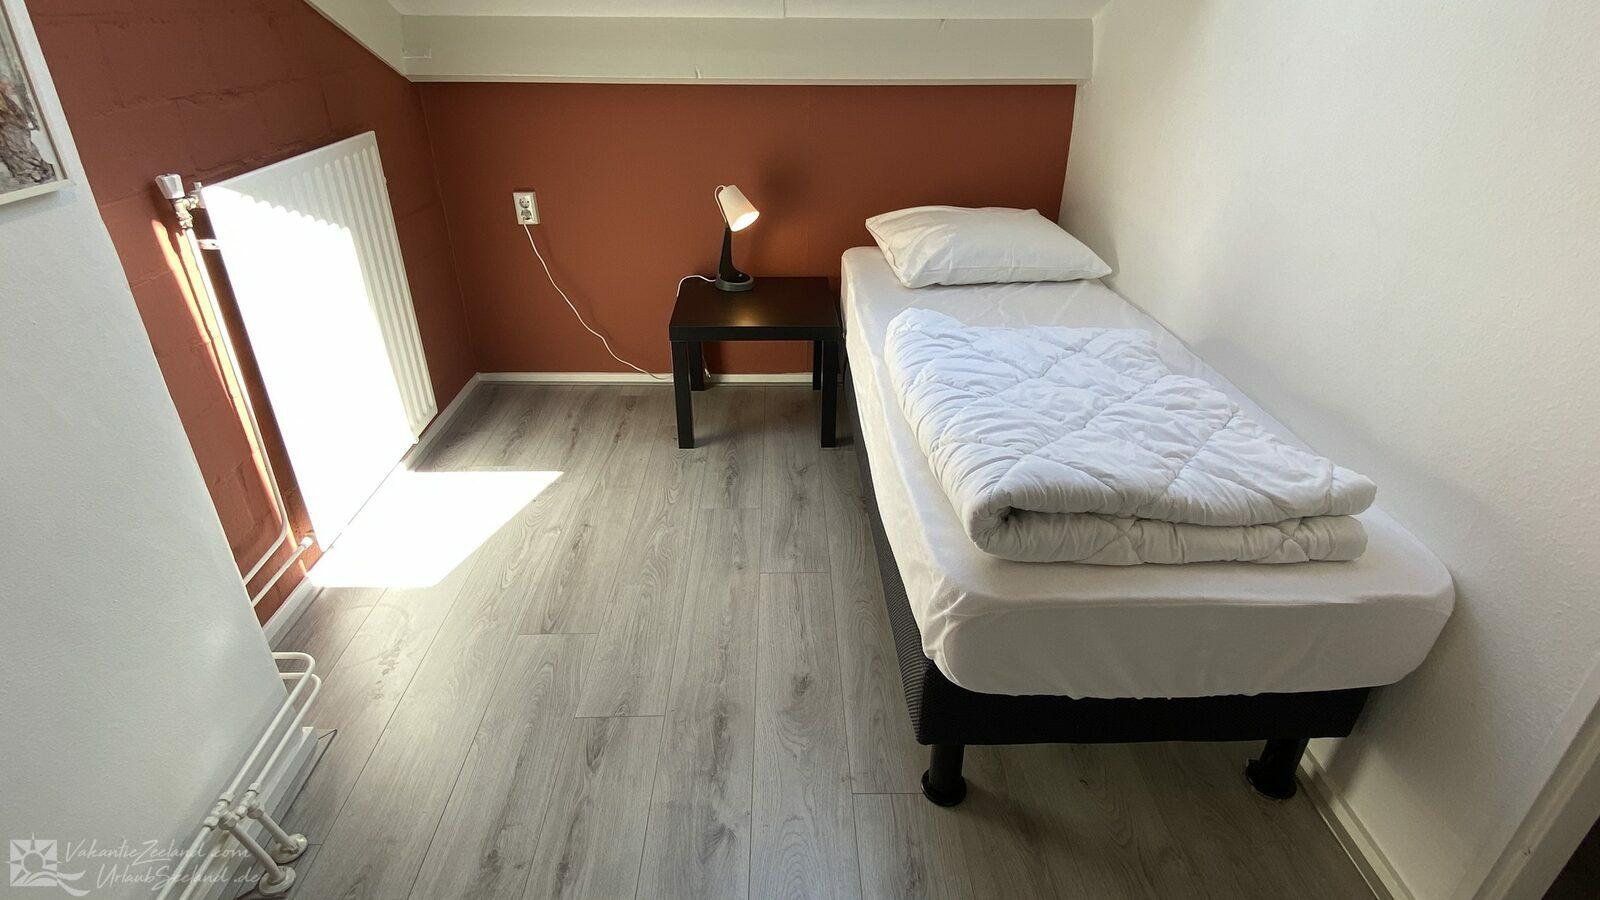 VZ1009 Apartment in Zoutelande